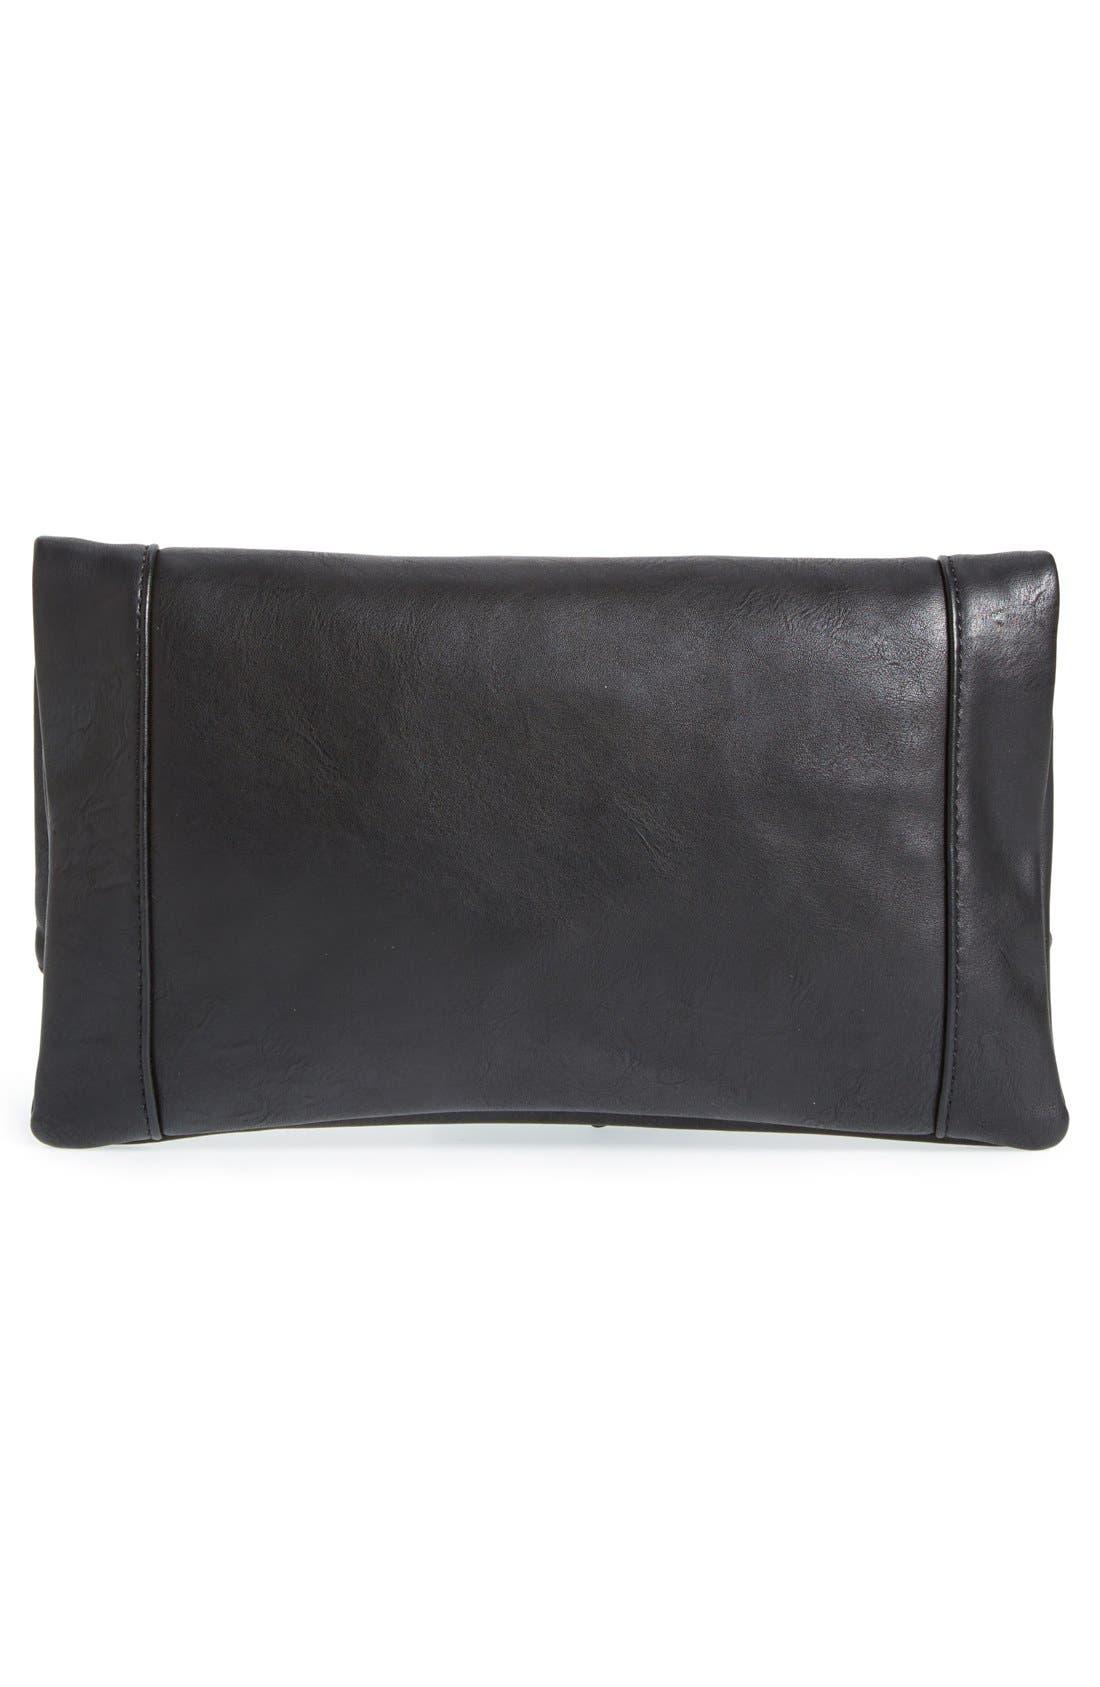 Marlena Faux Leather Foldover Clutch,                             Alternate thumbnail 3, color,                             JET BLACK